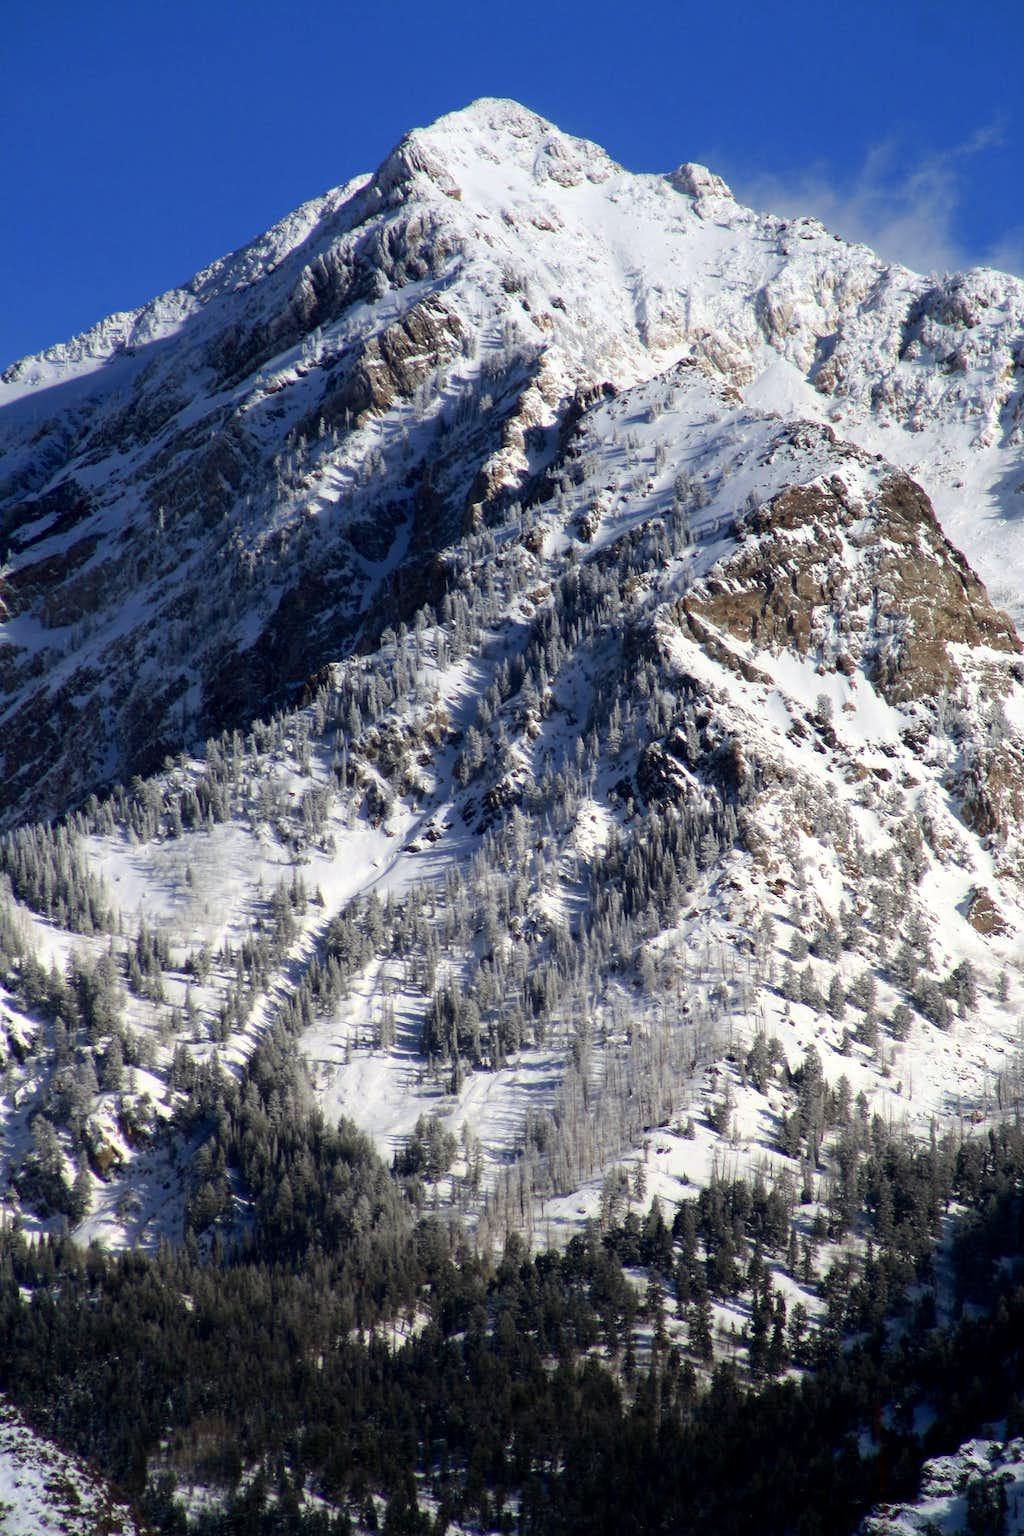 The SLC Twins AKA Broads Fork Twin Peaks